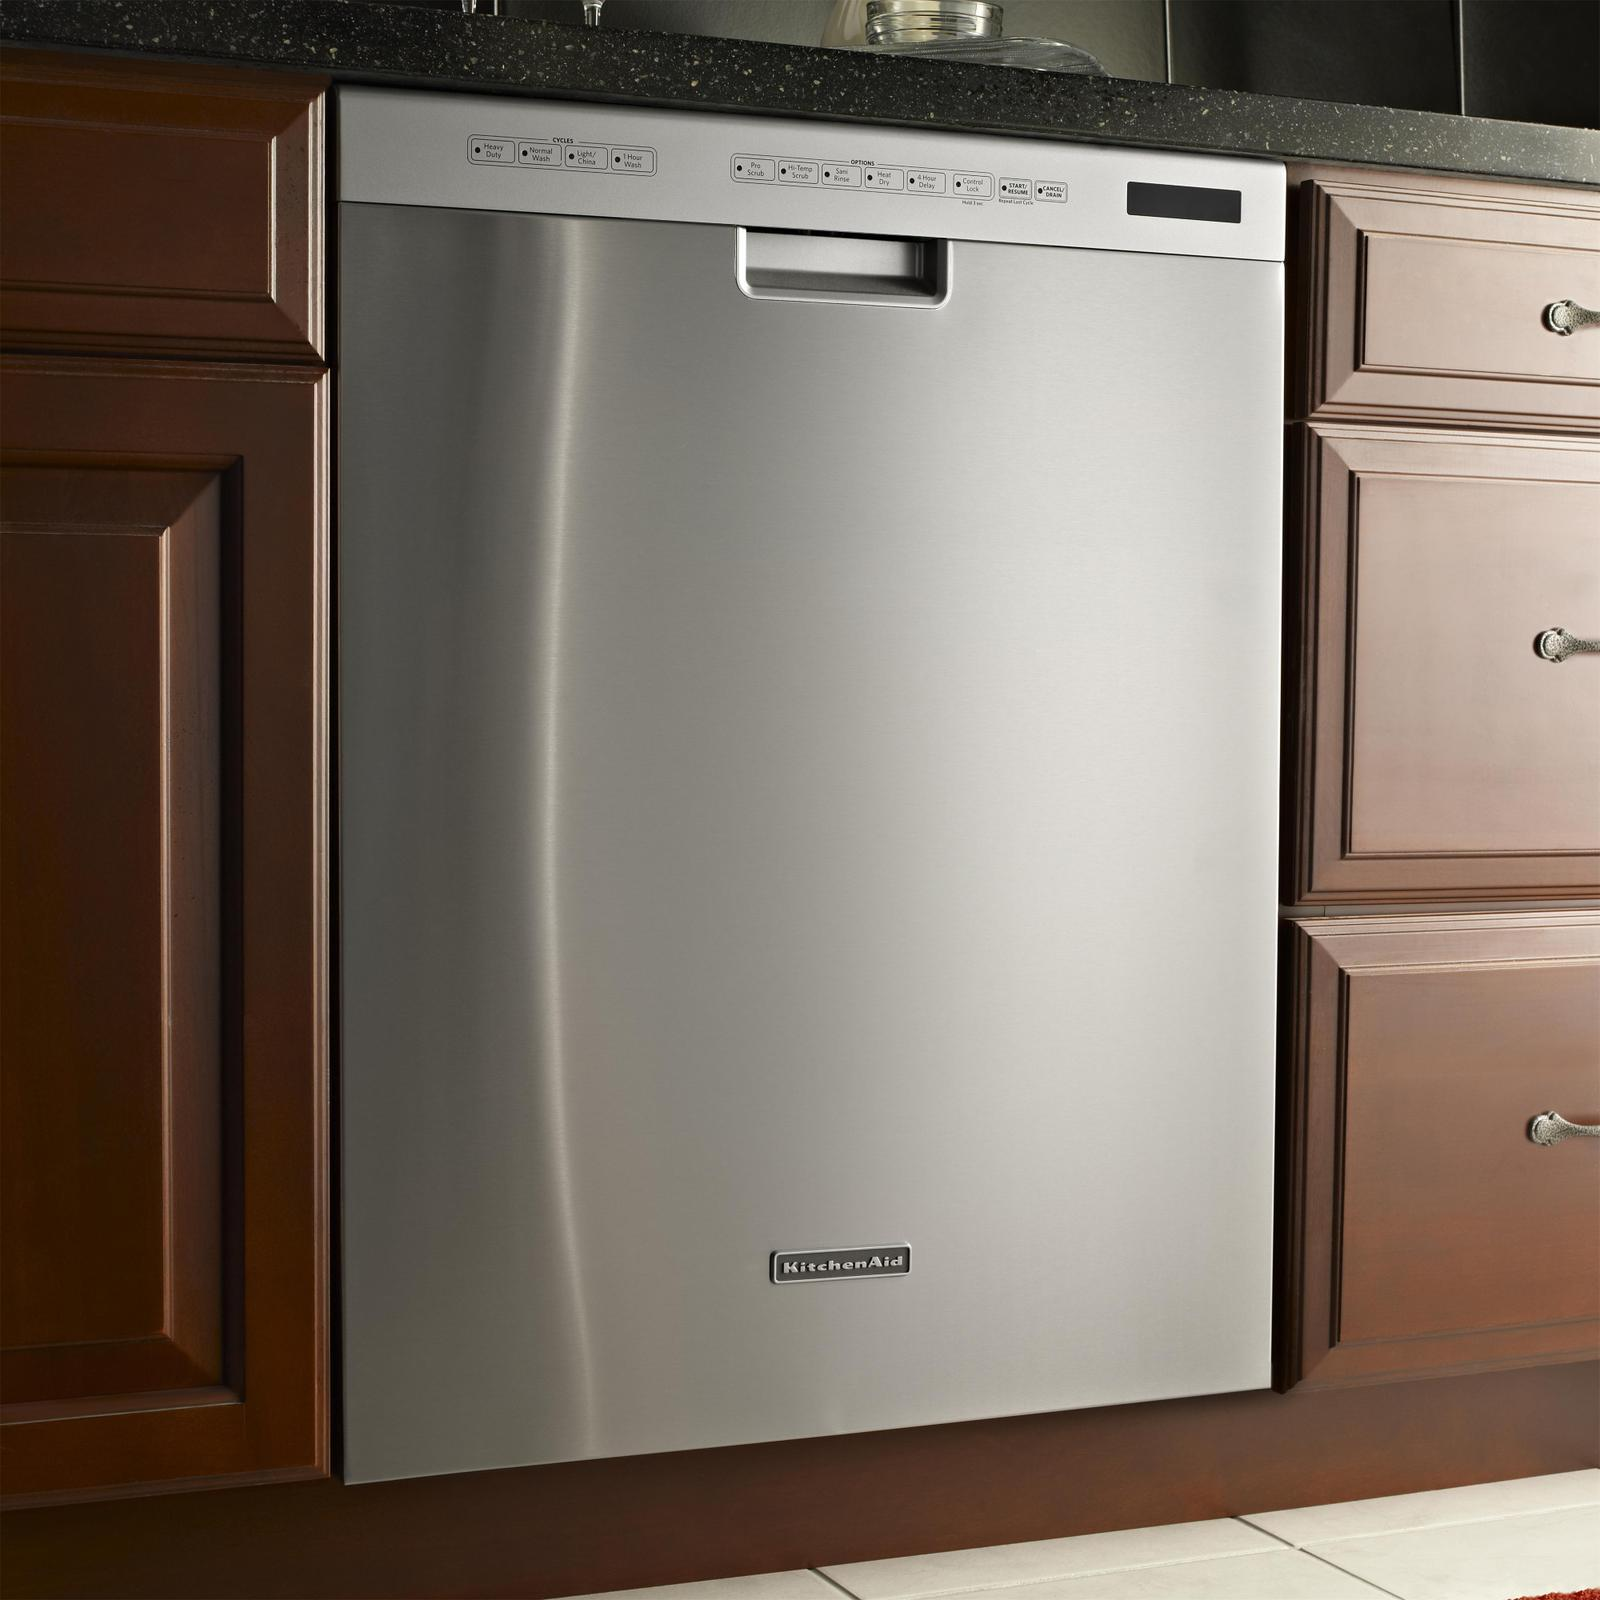 Kuds30cxbl kitchenaid kuds30cxbl superba series - Kitchenaid dishwasher not cleaning top rack ...